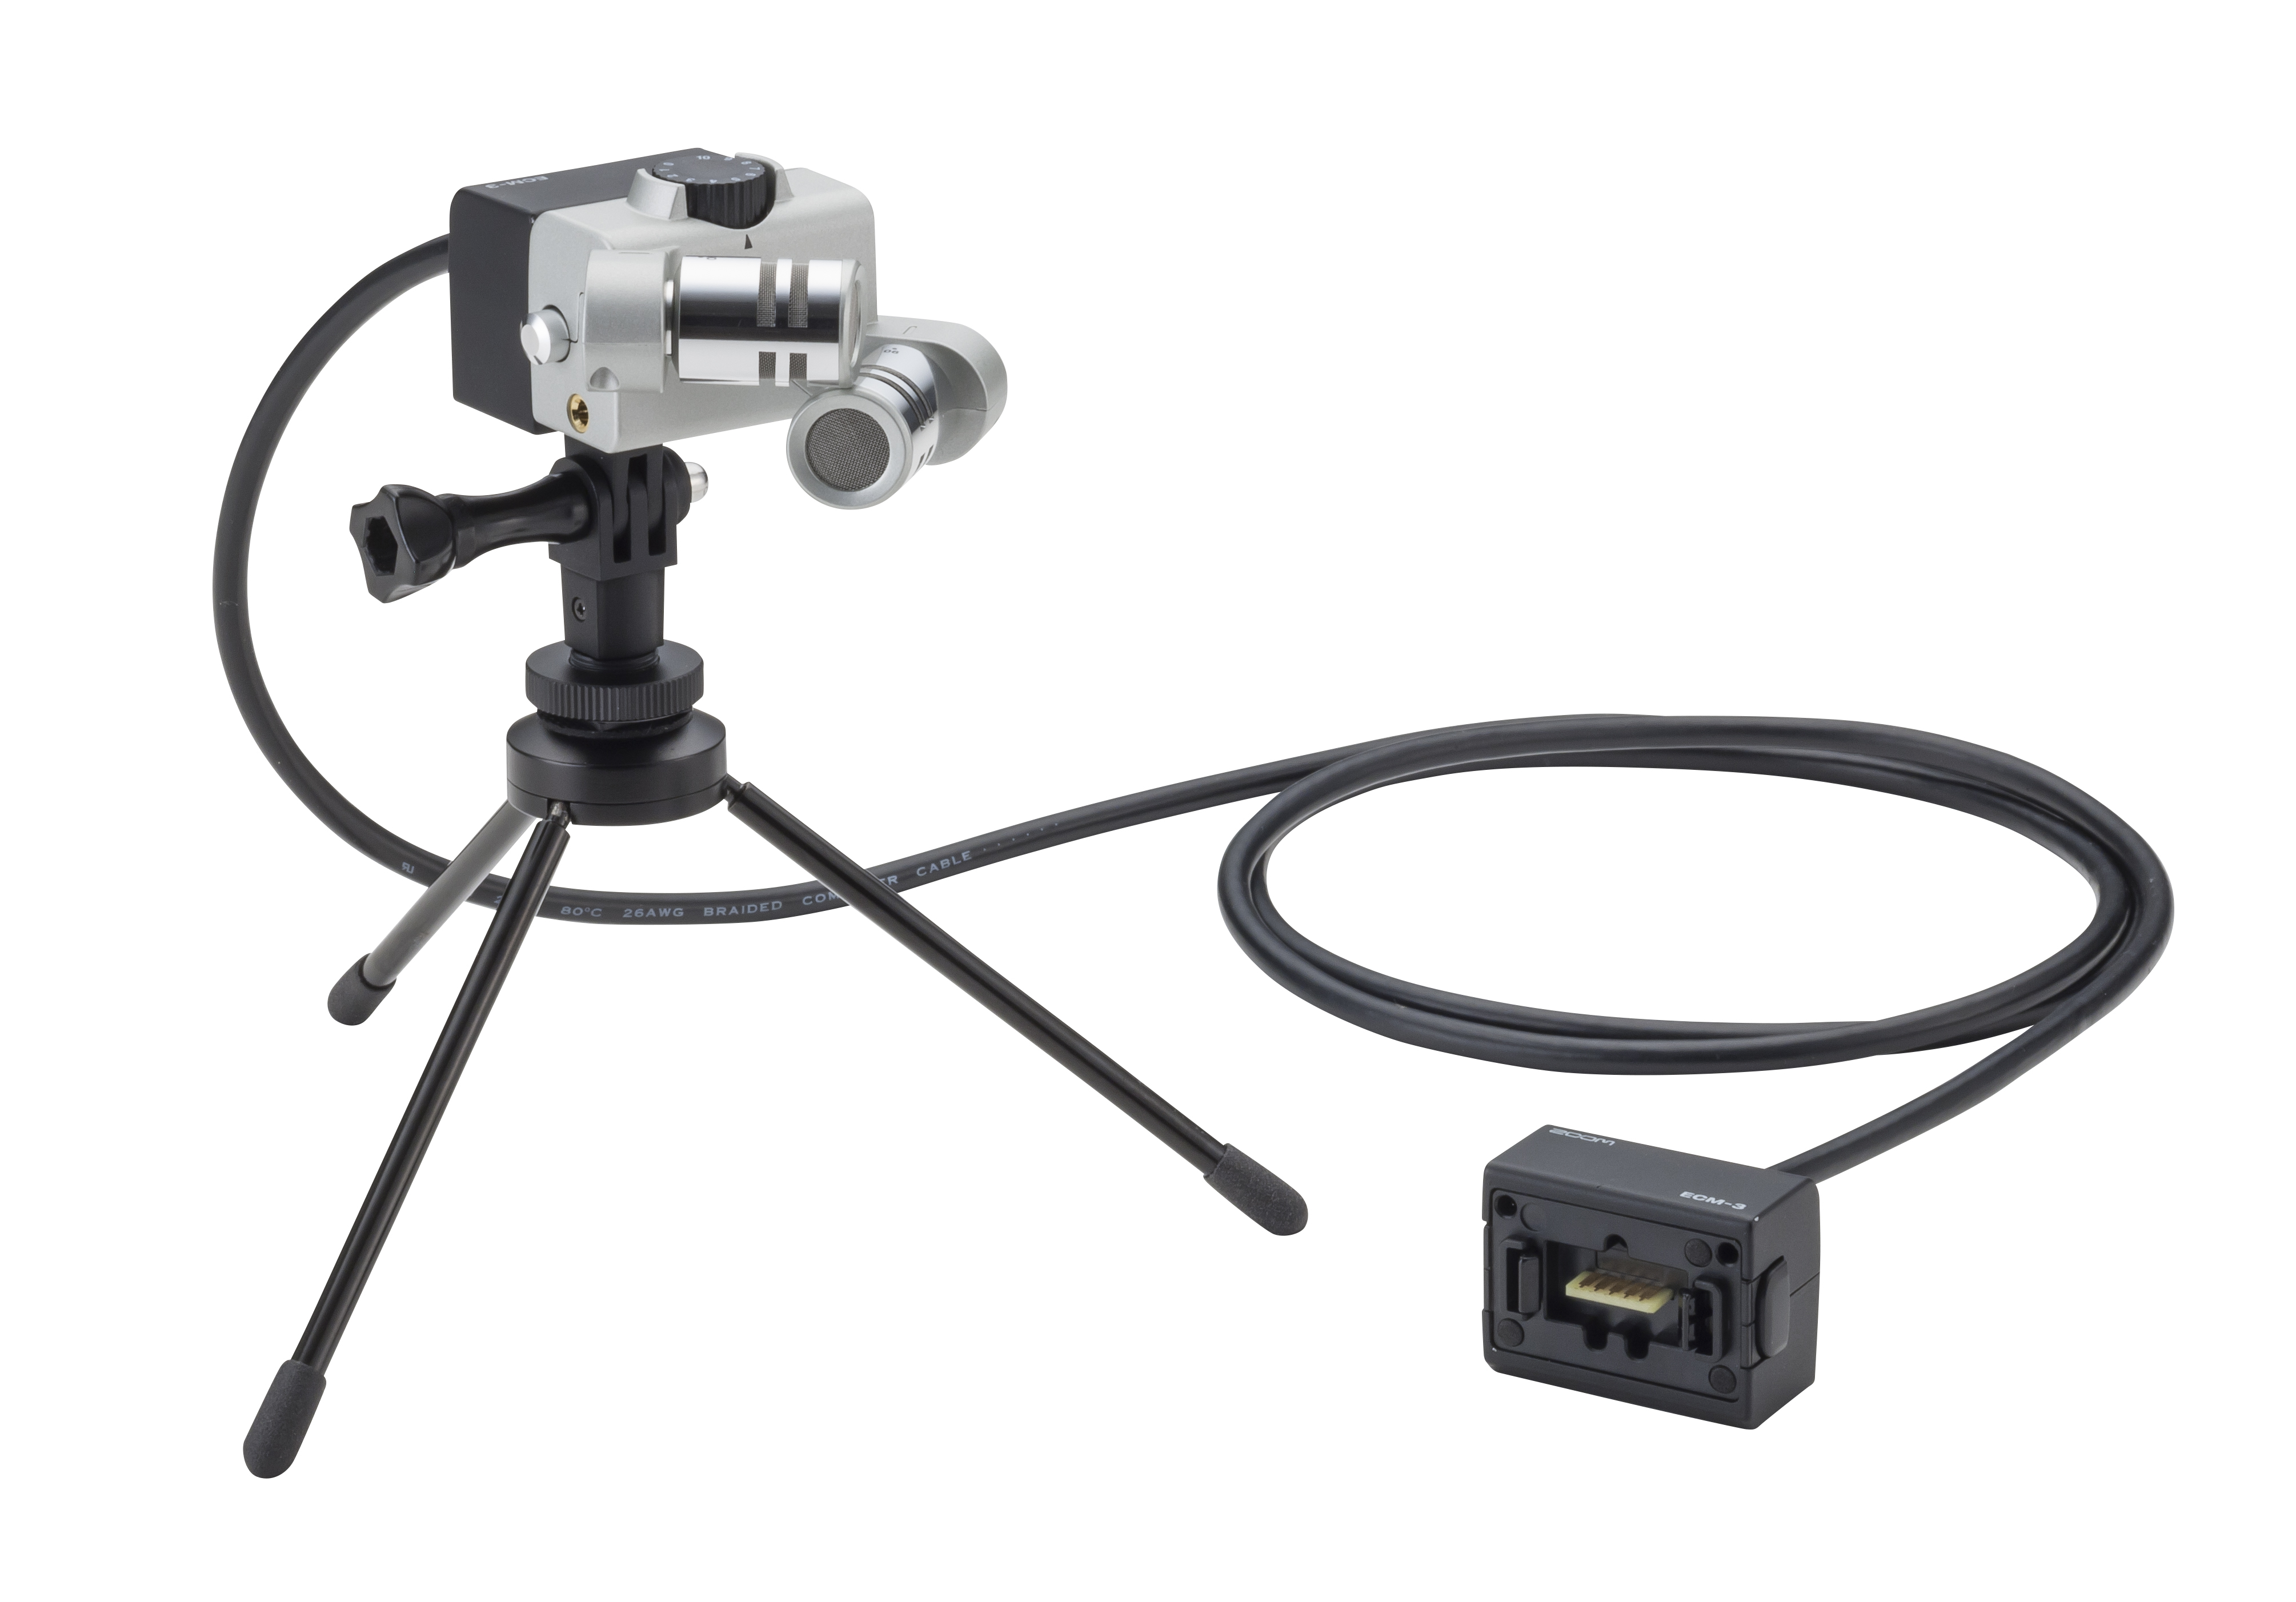 Ecm 3 Extension Cable For Zoom Interchangeable Input